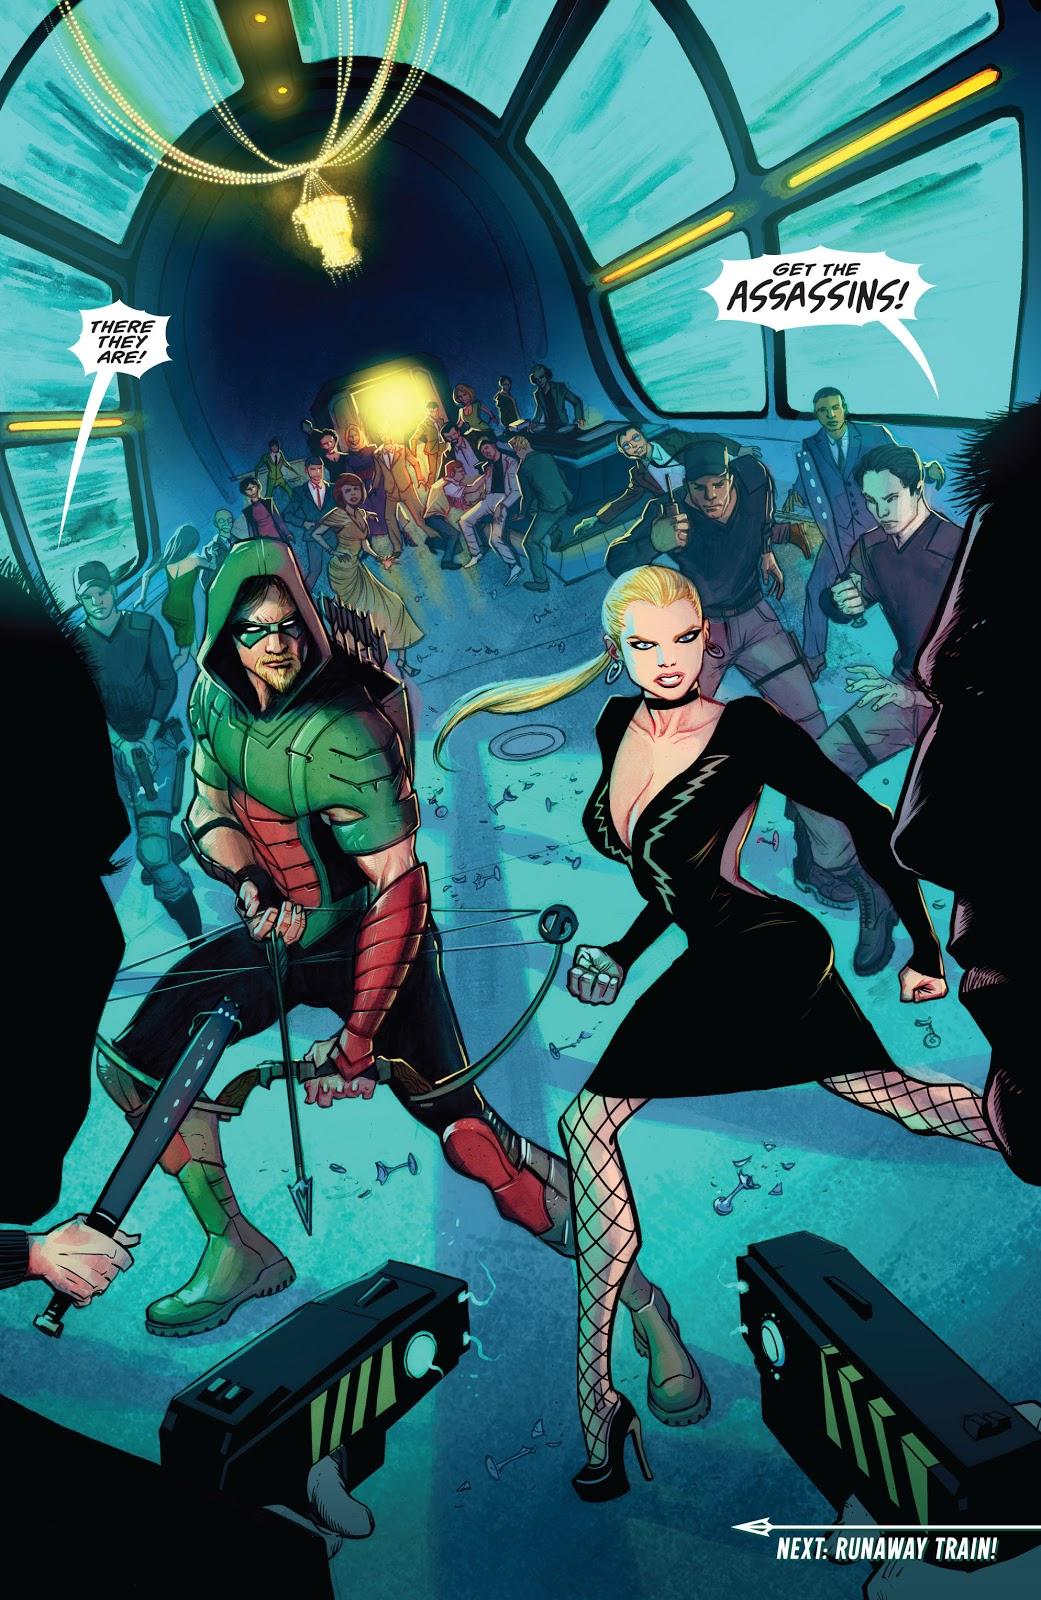 Green Arrow And Black Canary (Green Arrow Vol. 6 #10)